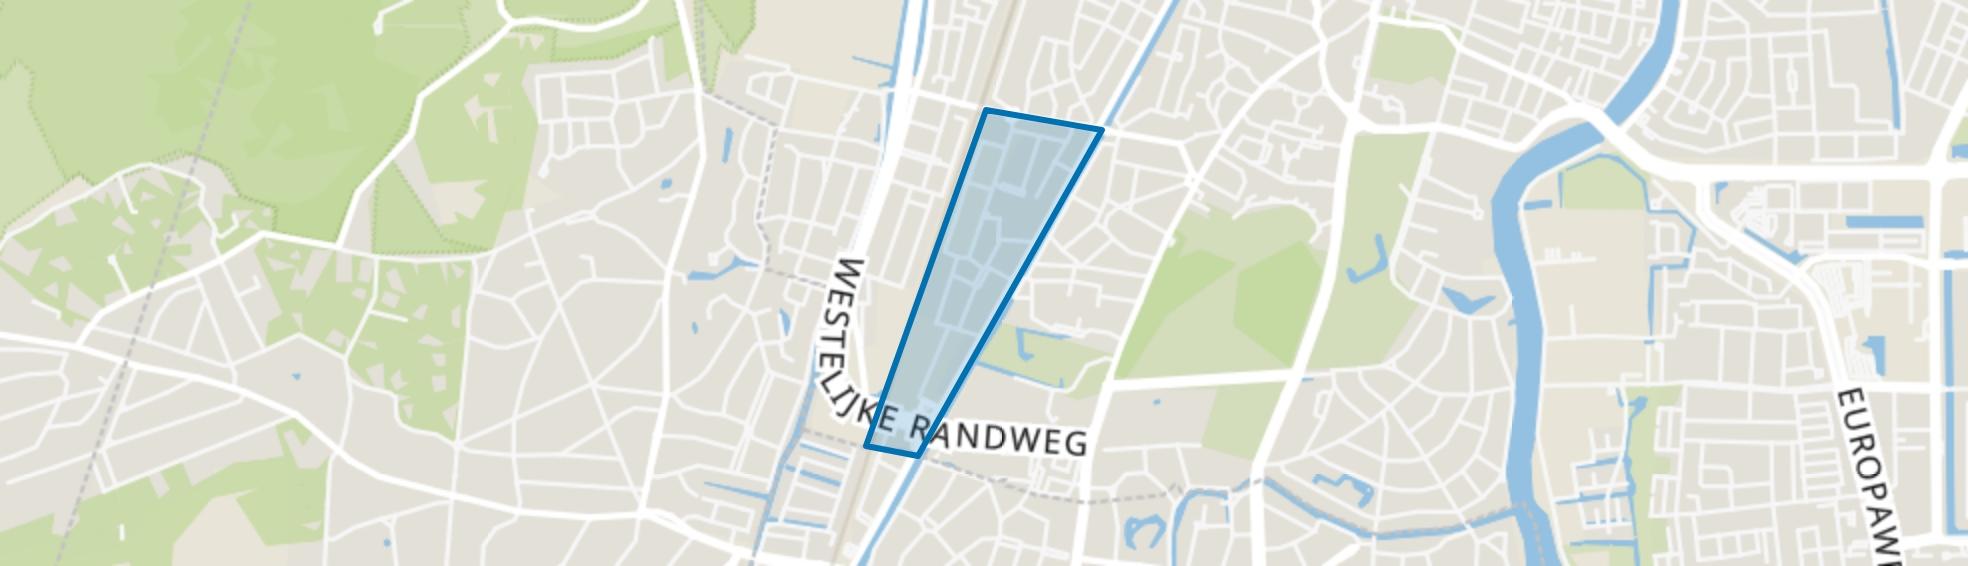 Natuurkundigenbuurt-oost, Haarlem map